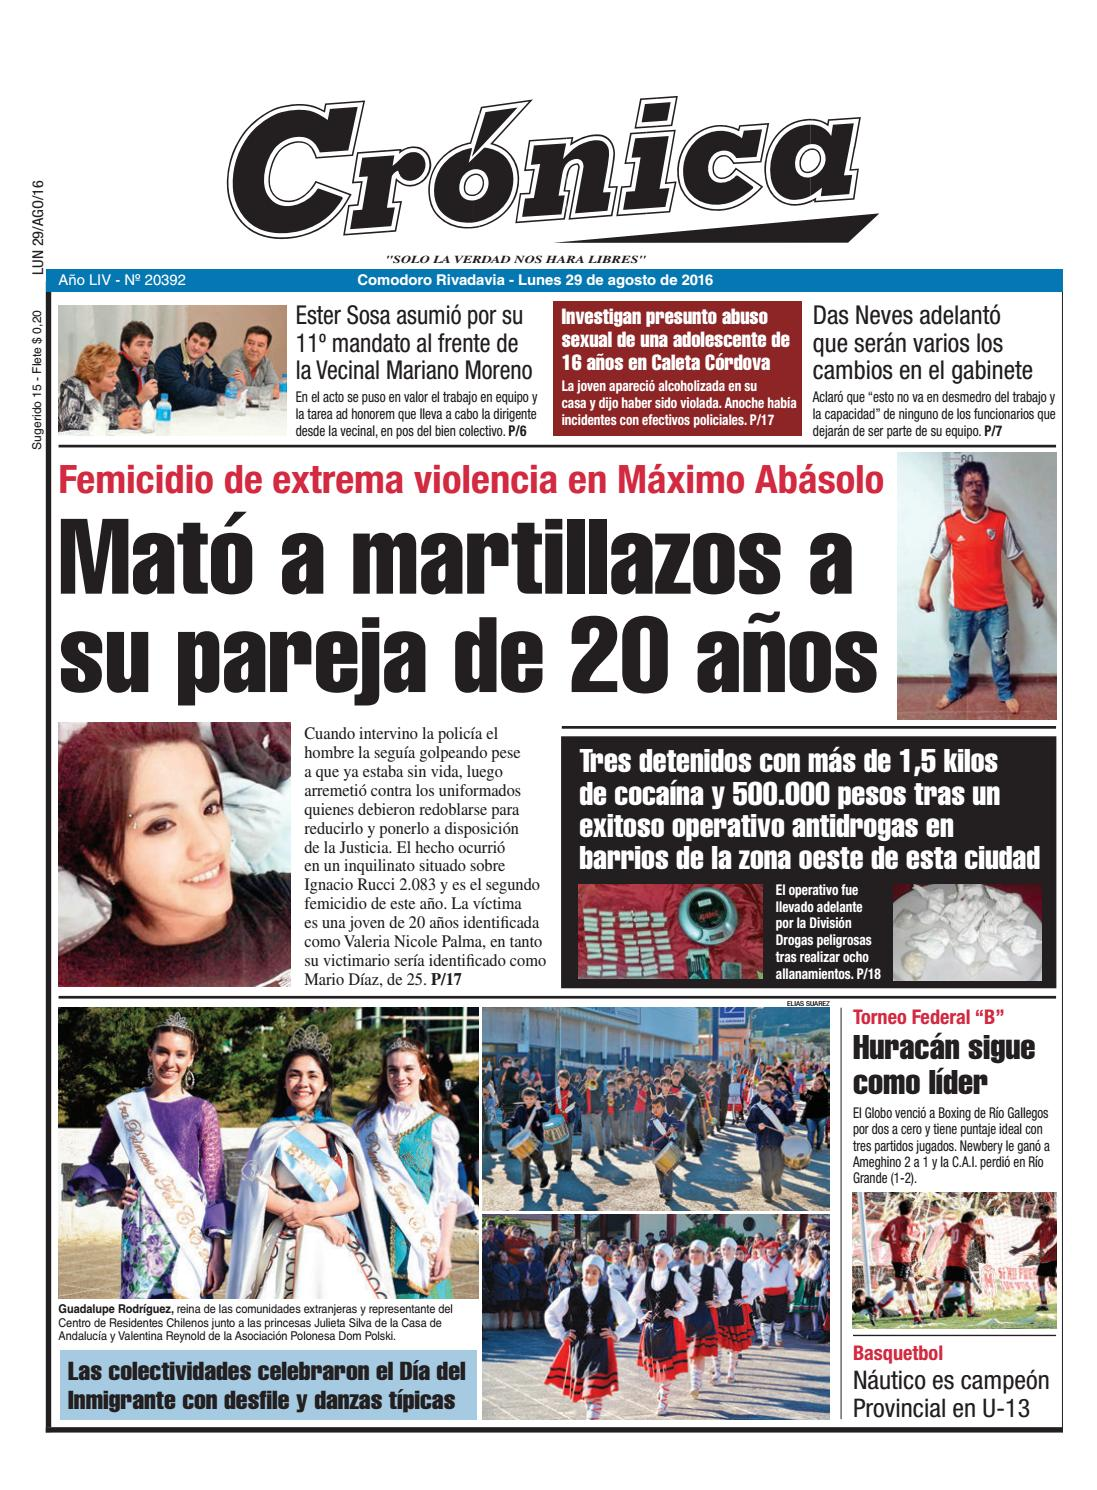 17f342d55ea8c017177eb3dd9bee6e5d by Diario Crónica - issuu